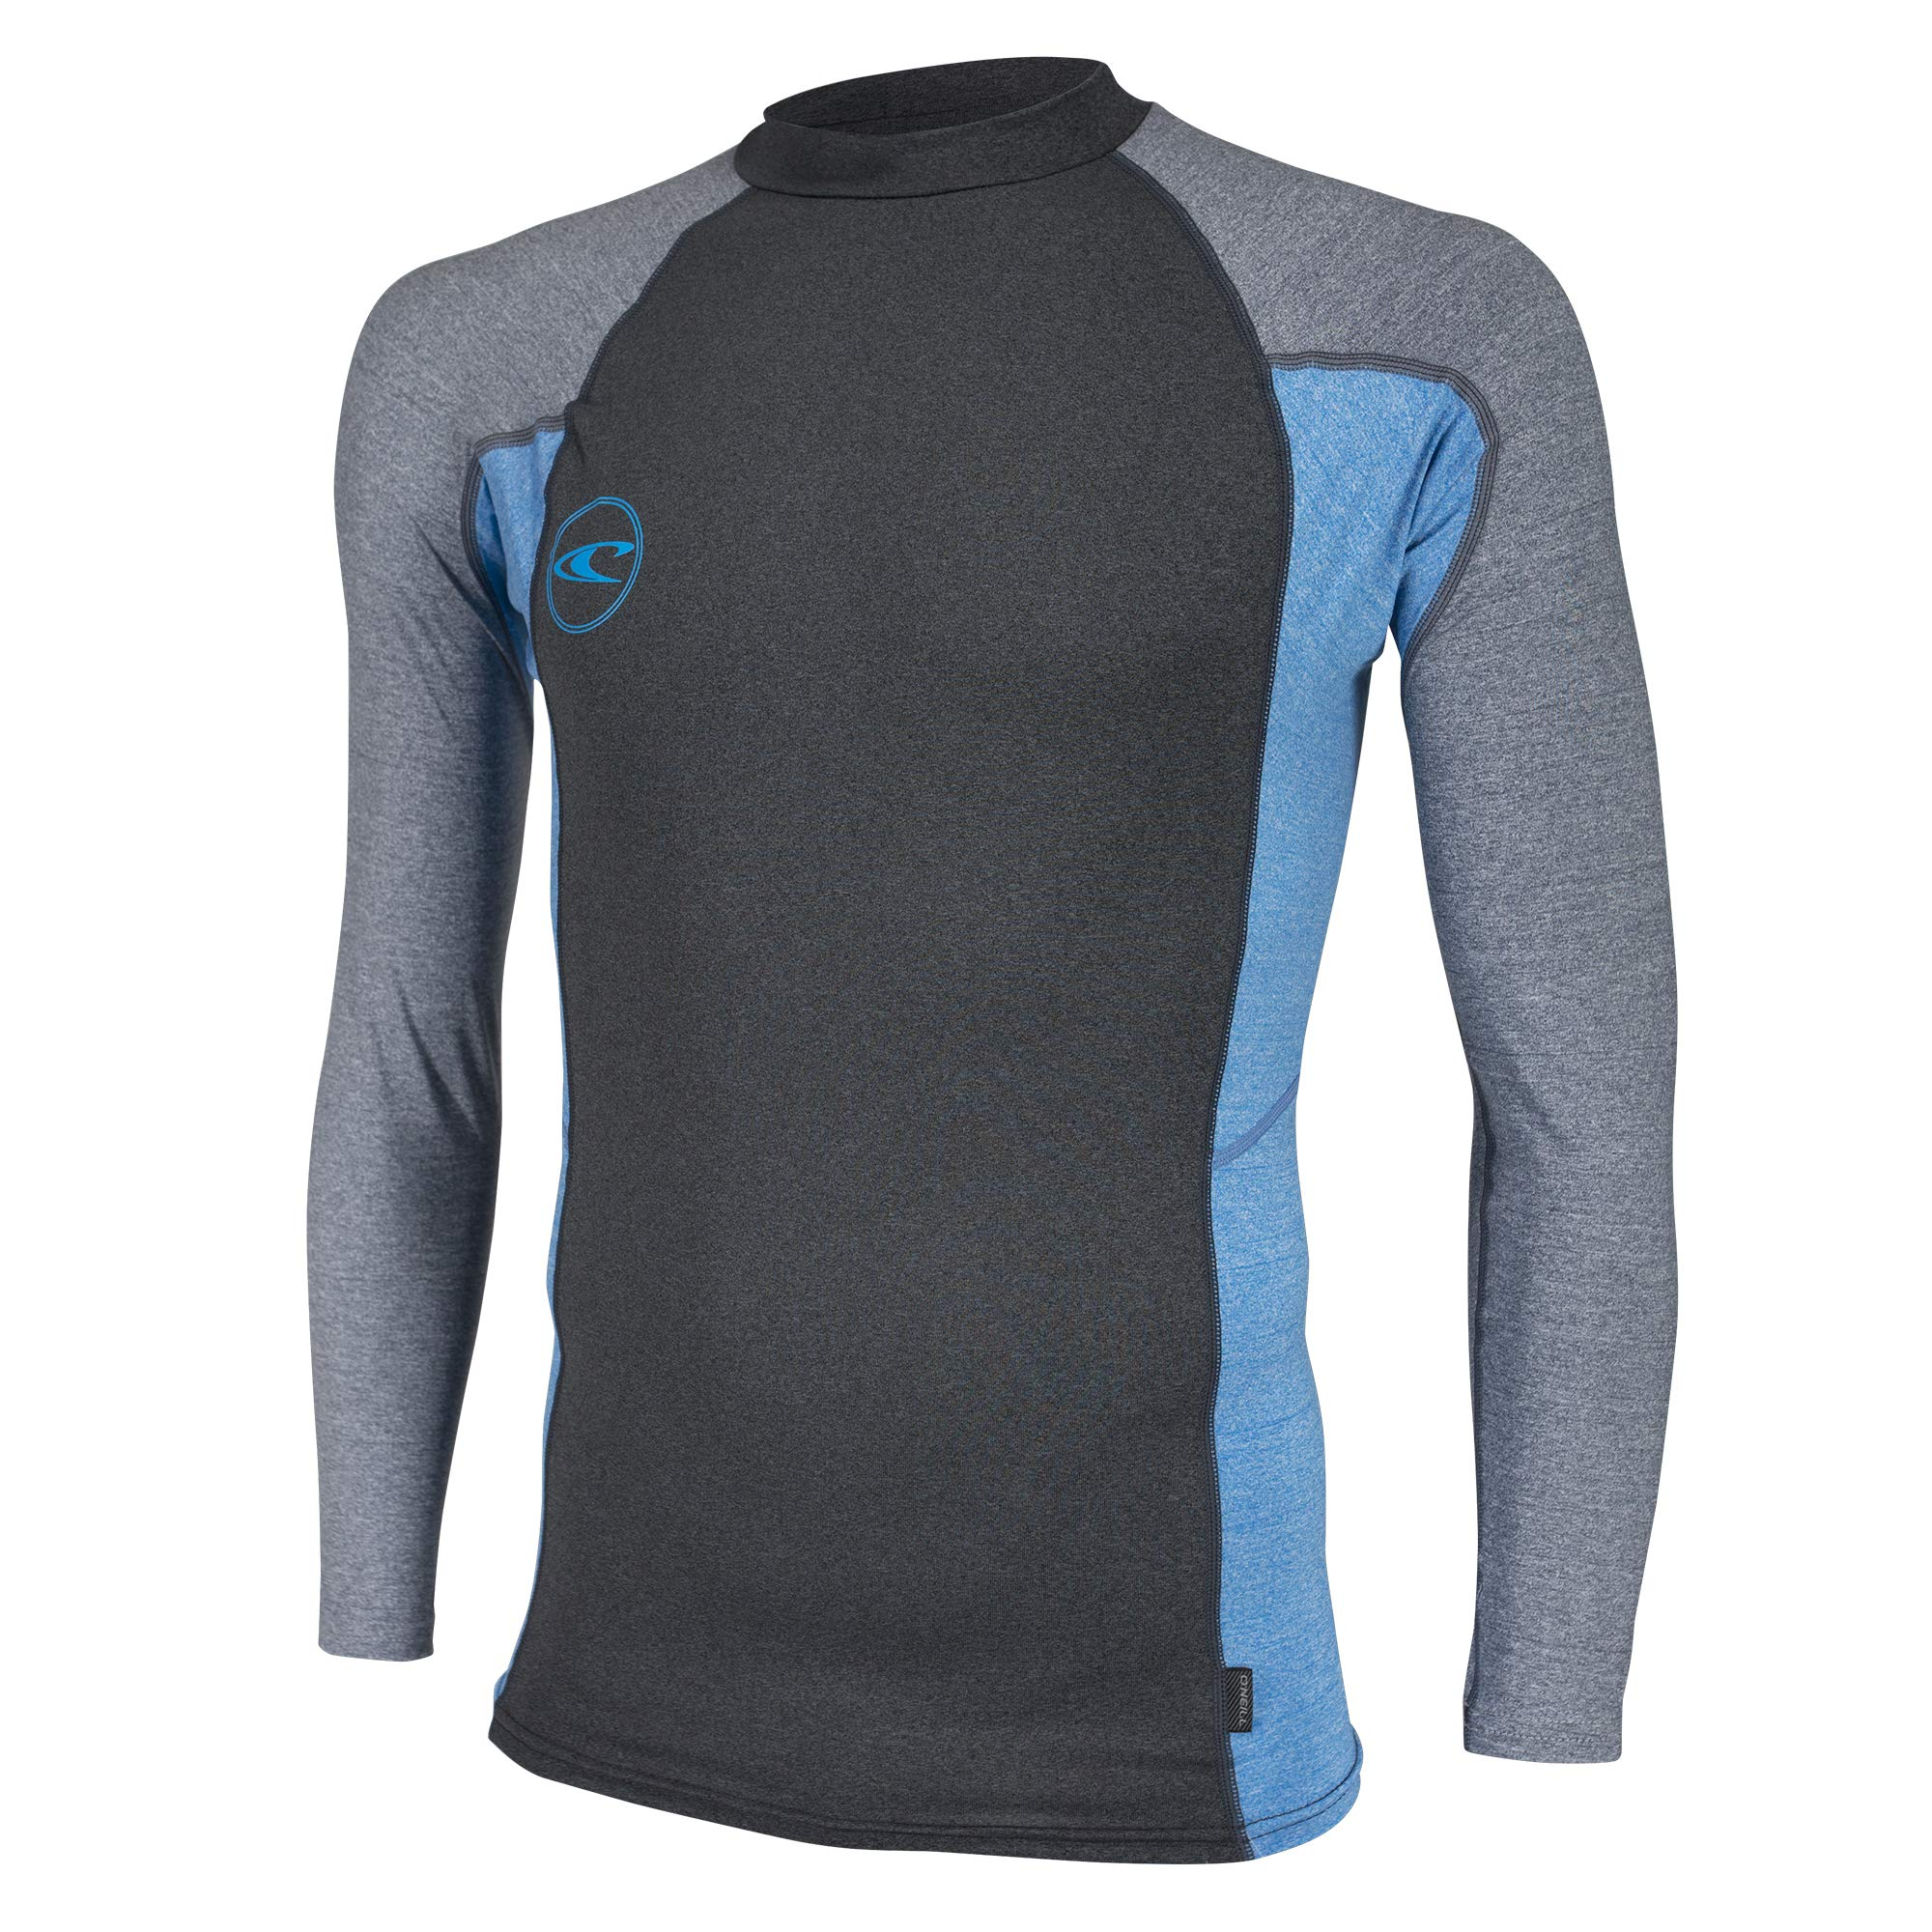 O'Neill Men's Basic Long Sleeve Premium Rash Guard, Black Brite Blue Cool Grey, Large